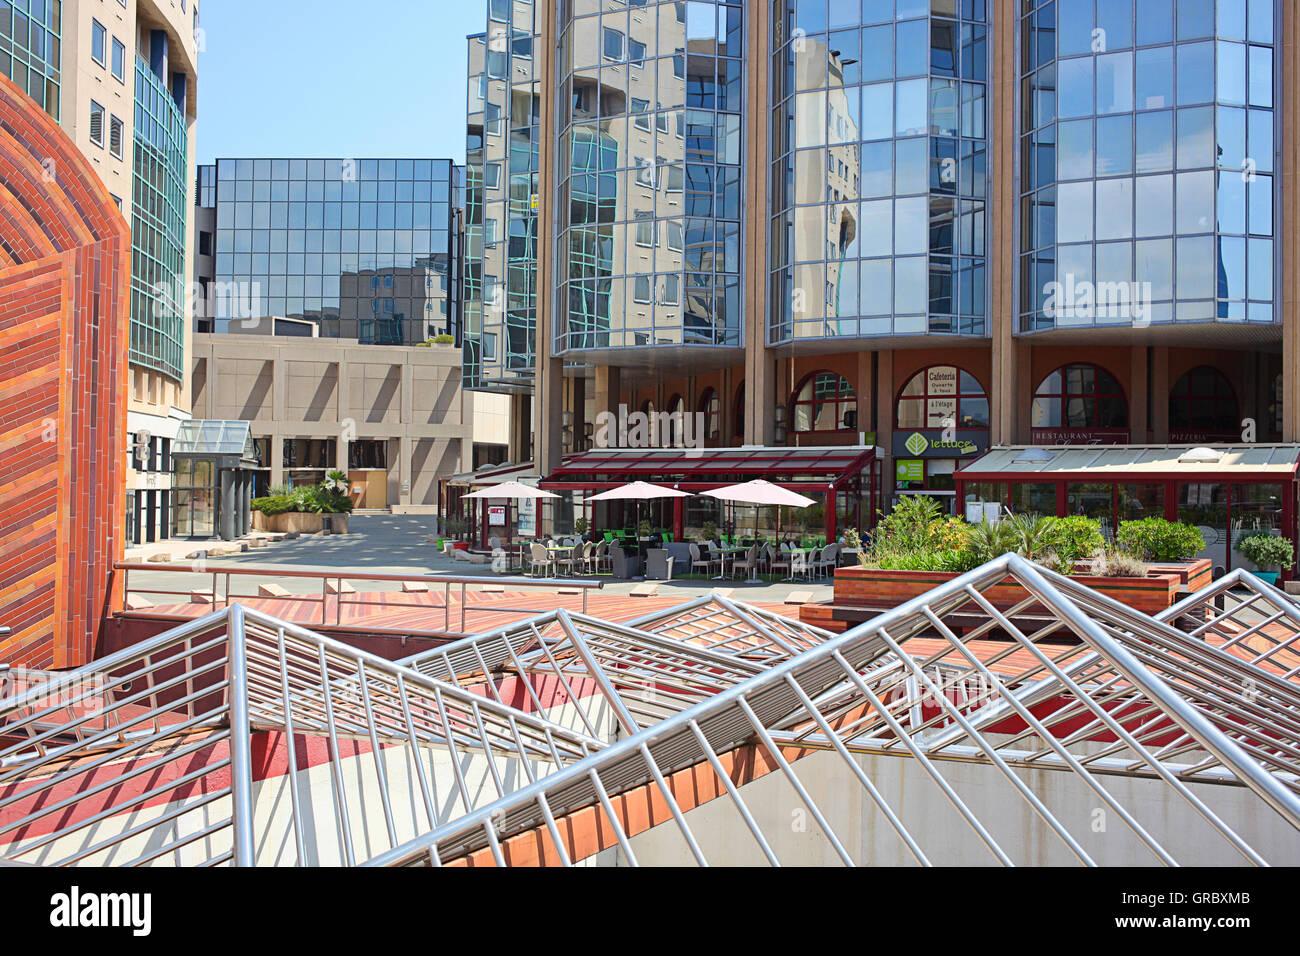 Porte De L'Arenas, Business center and office buildings - Stock Image